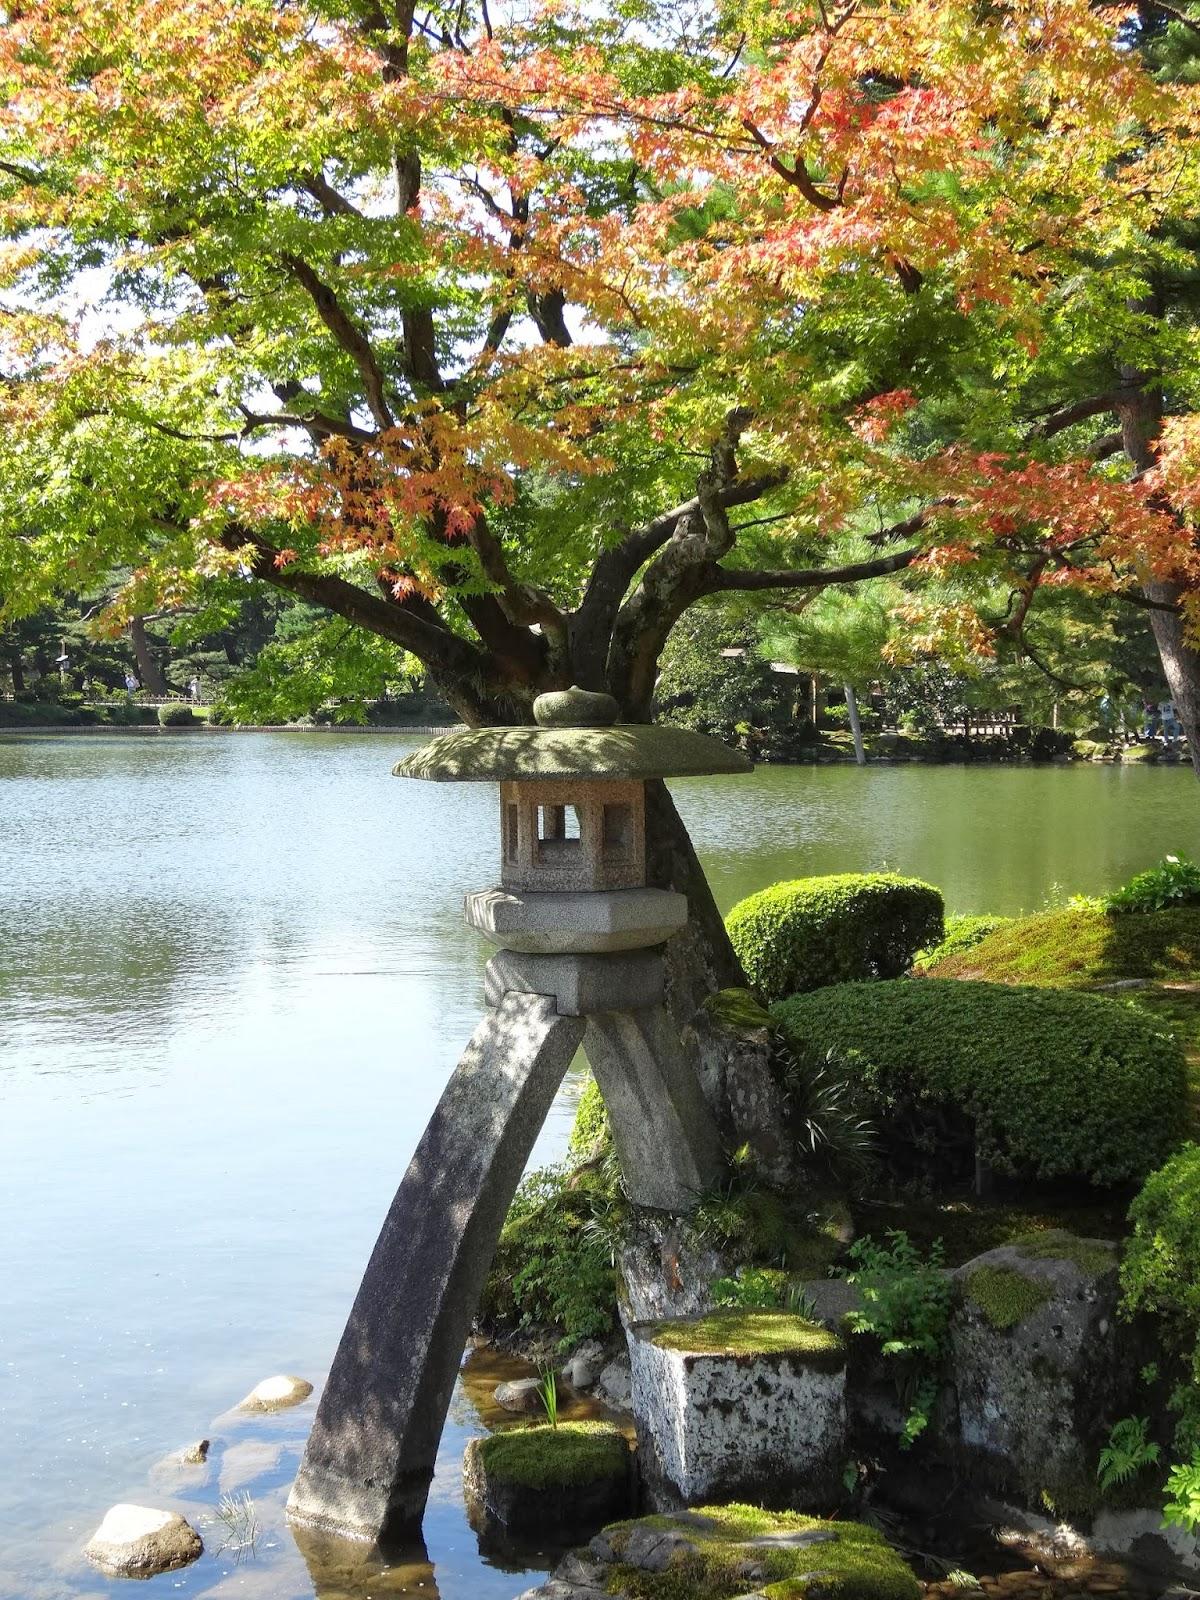 Le blog de parcs et jardins de l 39 oise le jardin kenrokuen for Jardin kenrokuen